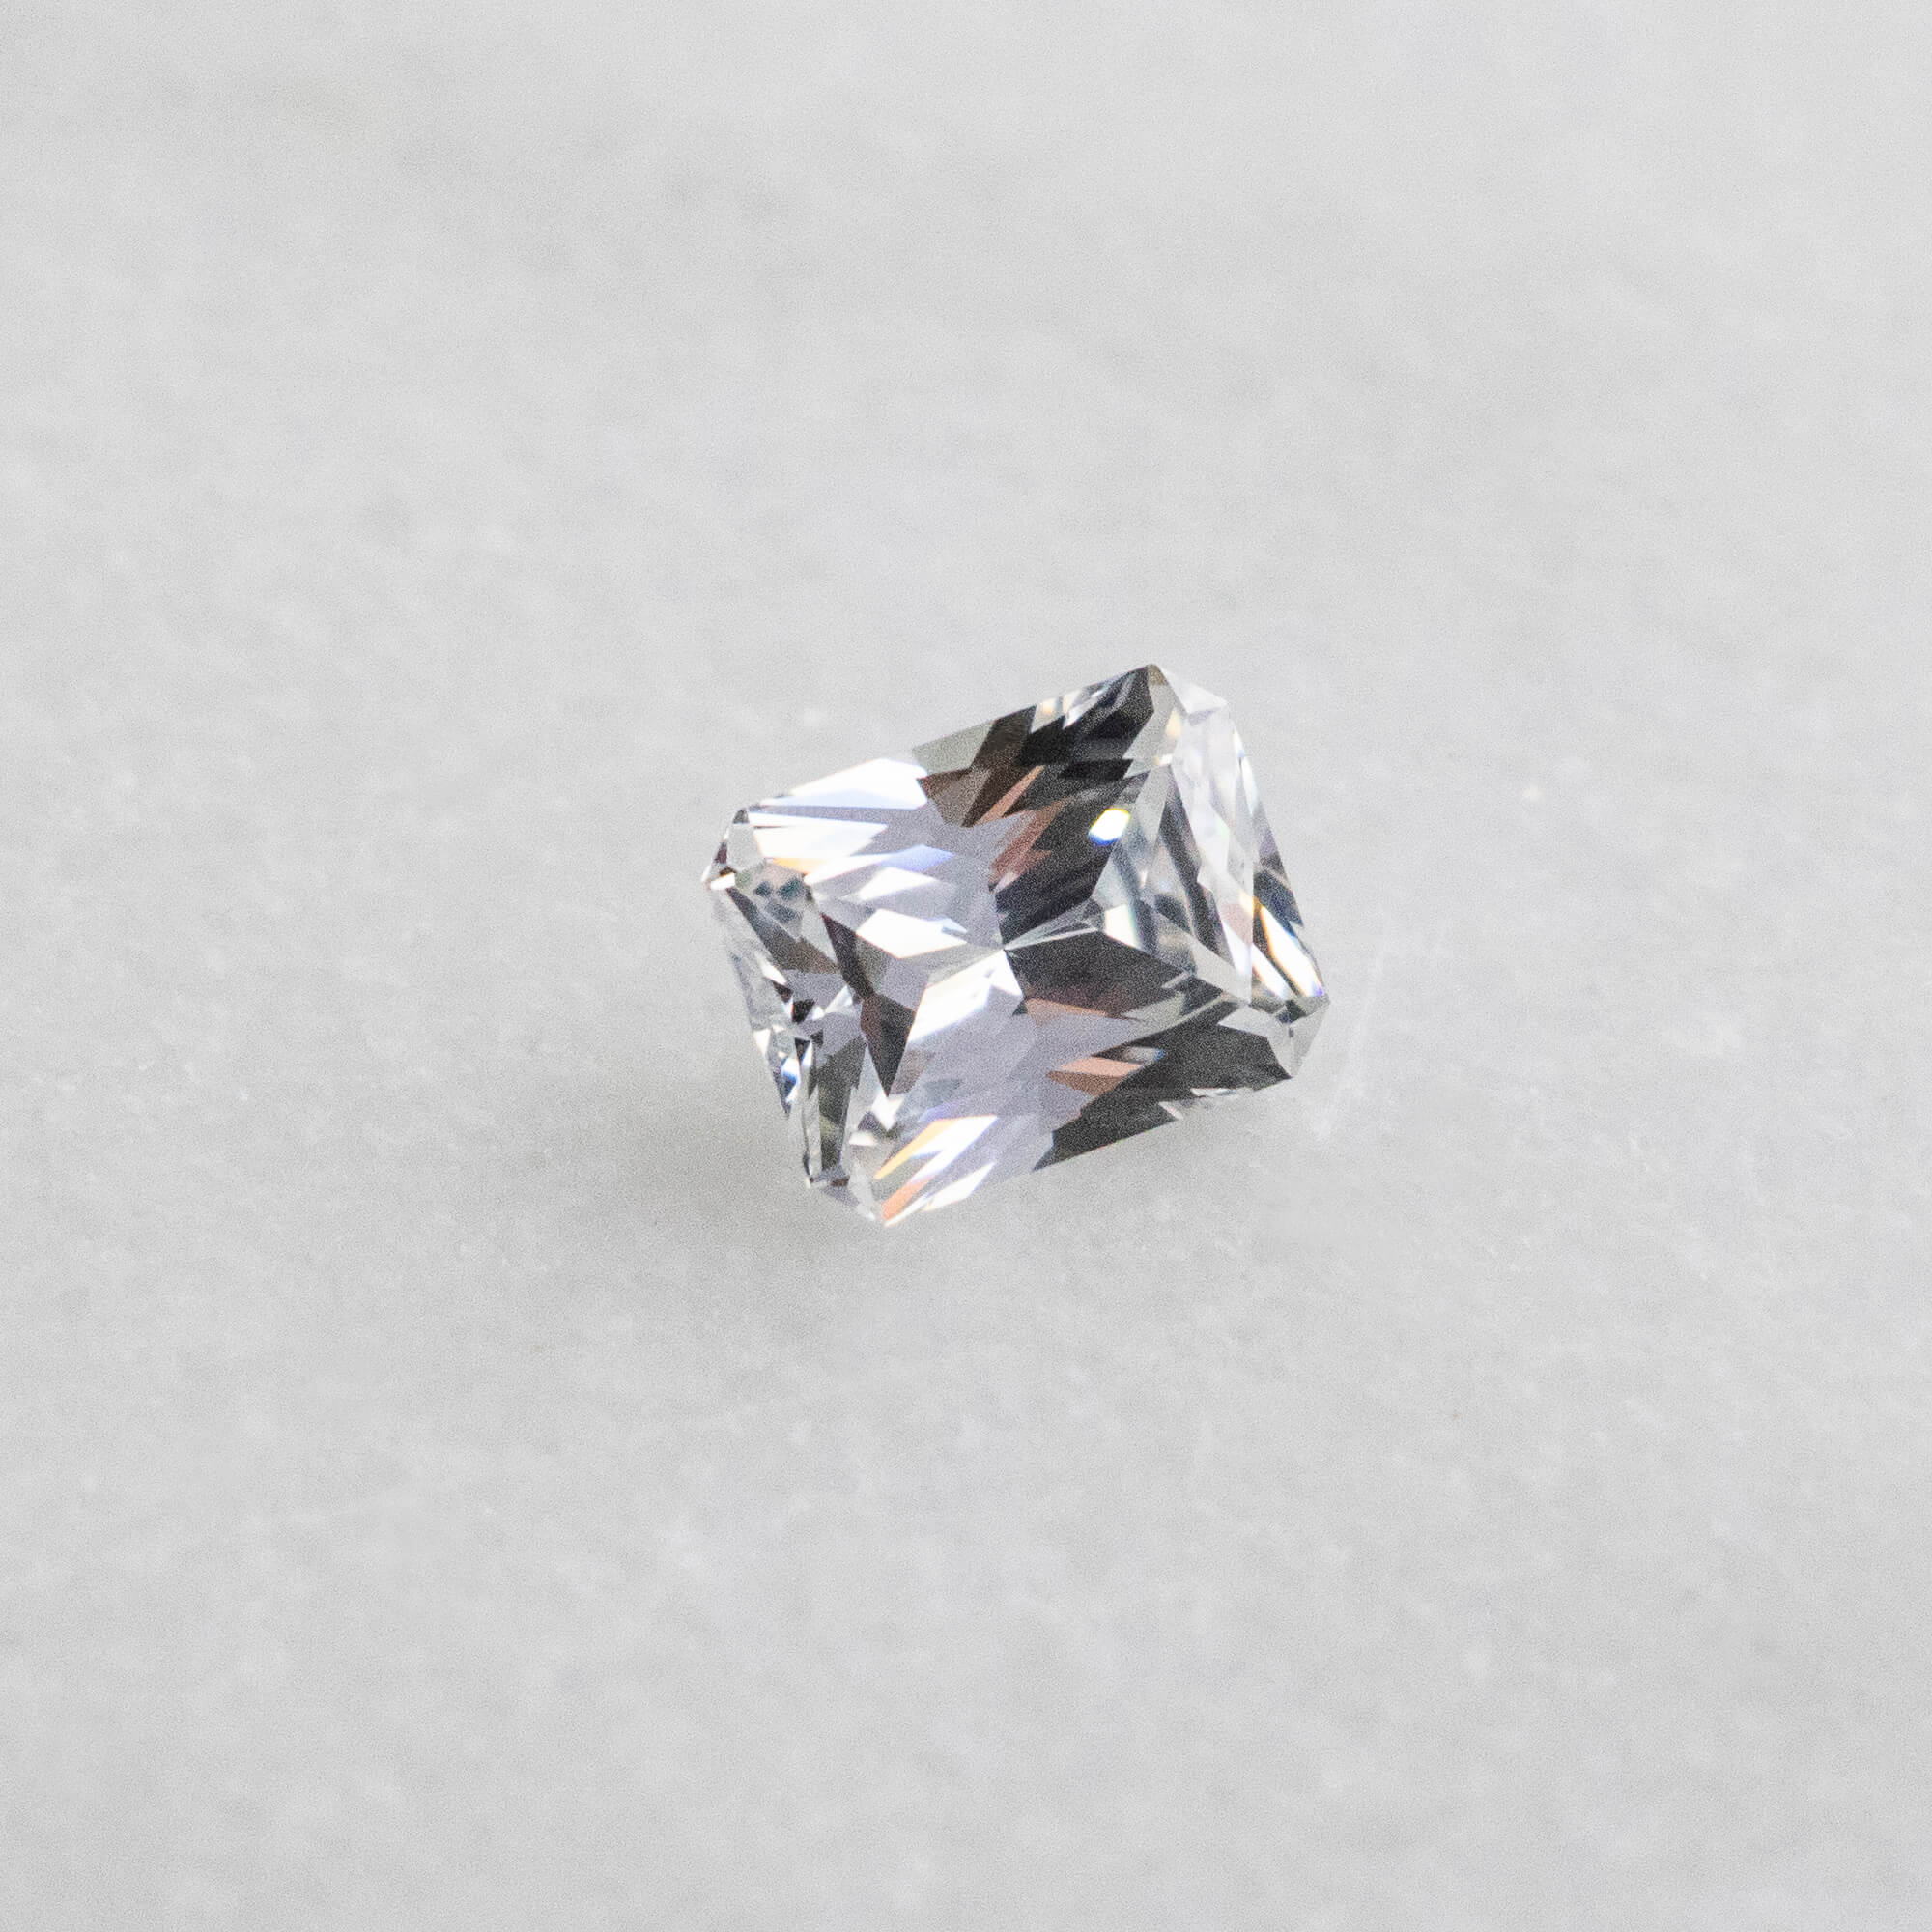 A Radiant Nexus Diamond alternative.